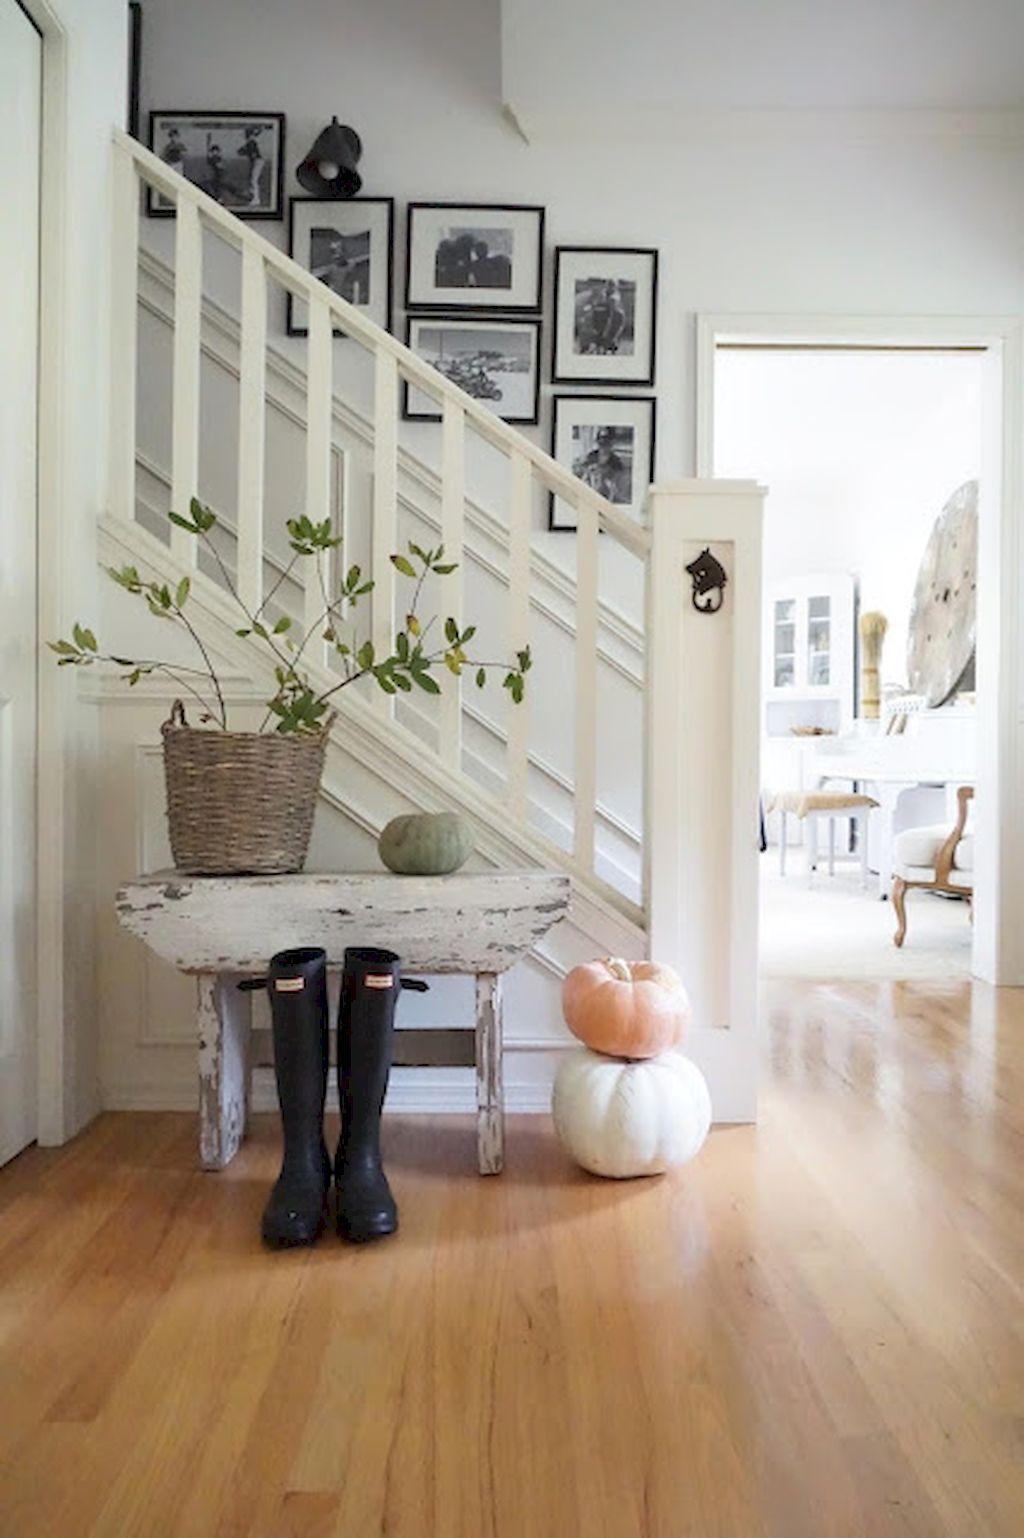 Modern Farmhouse Staircase Ideas : modern, farmhouse, staircase, ideas, Modern, Farmhouse, Staircase, Decor, Ideas, Decor,, Living, Room,